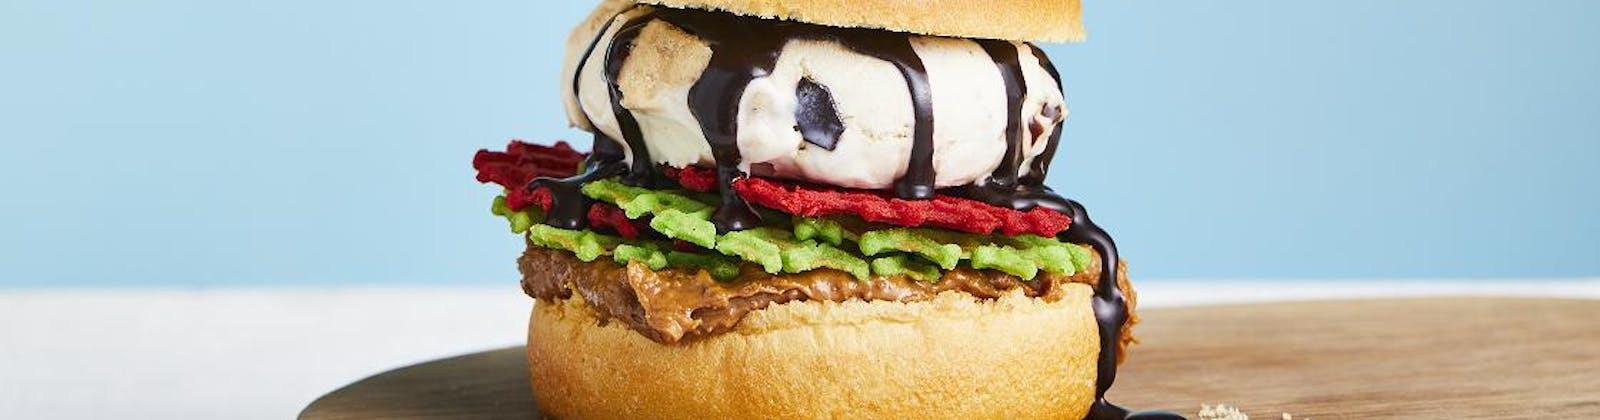 ben and jerry's ice cream brioche impossible burger